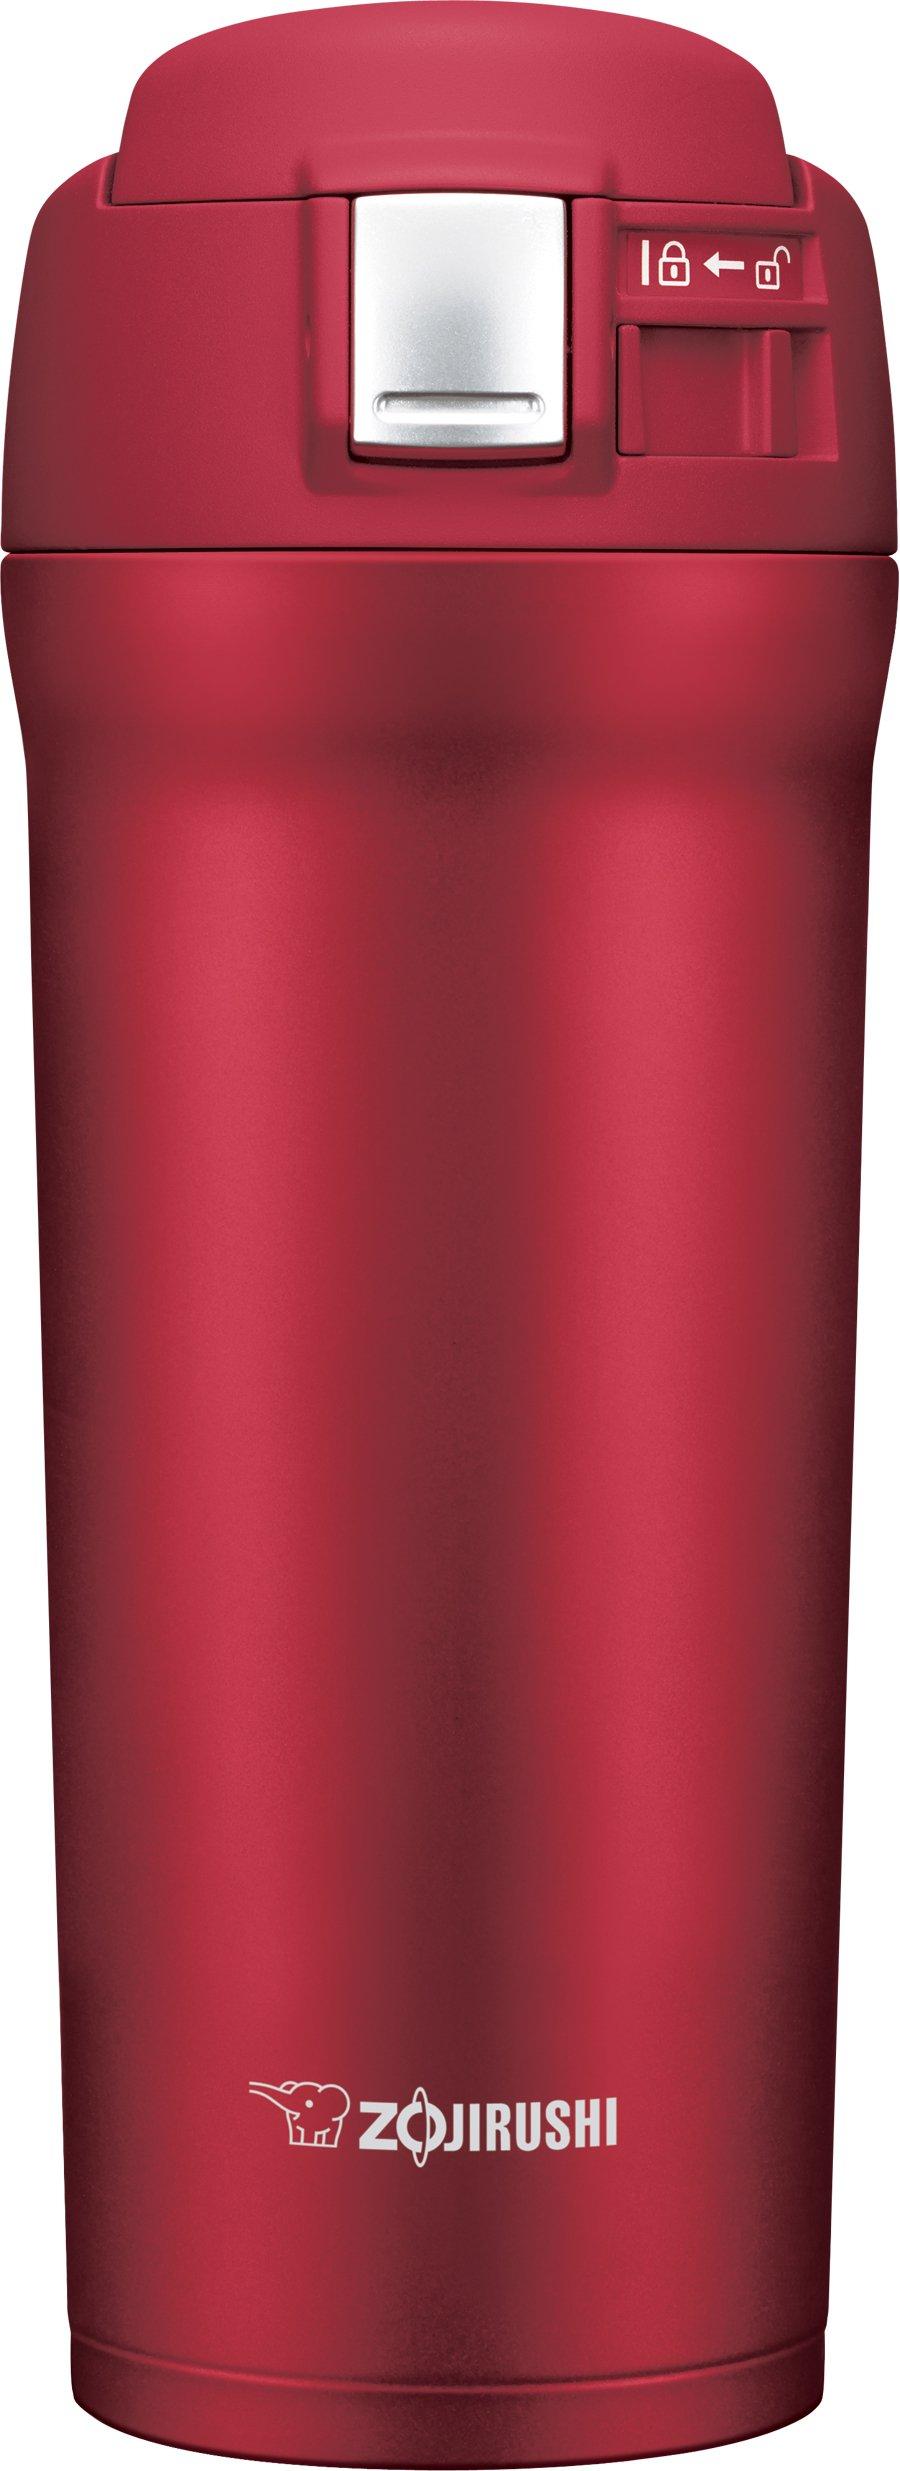 Zojirushi SM-YAE48RA Travel Mug, 16 oz, Cherry Red